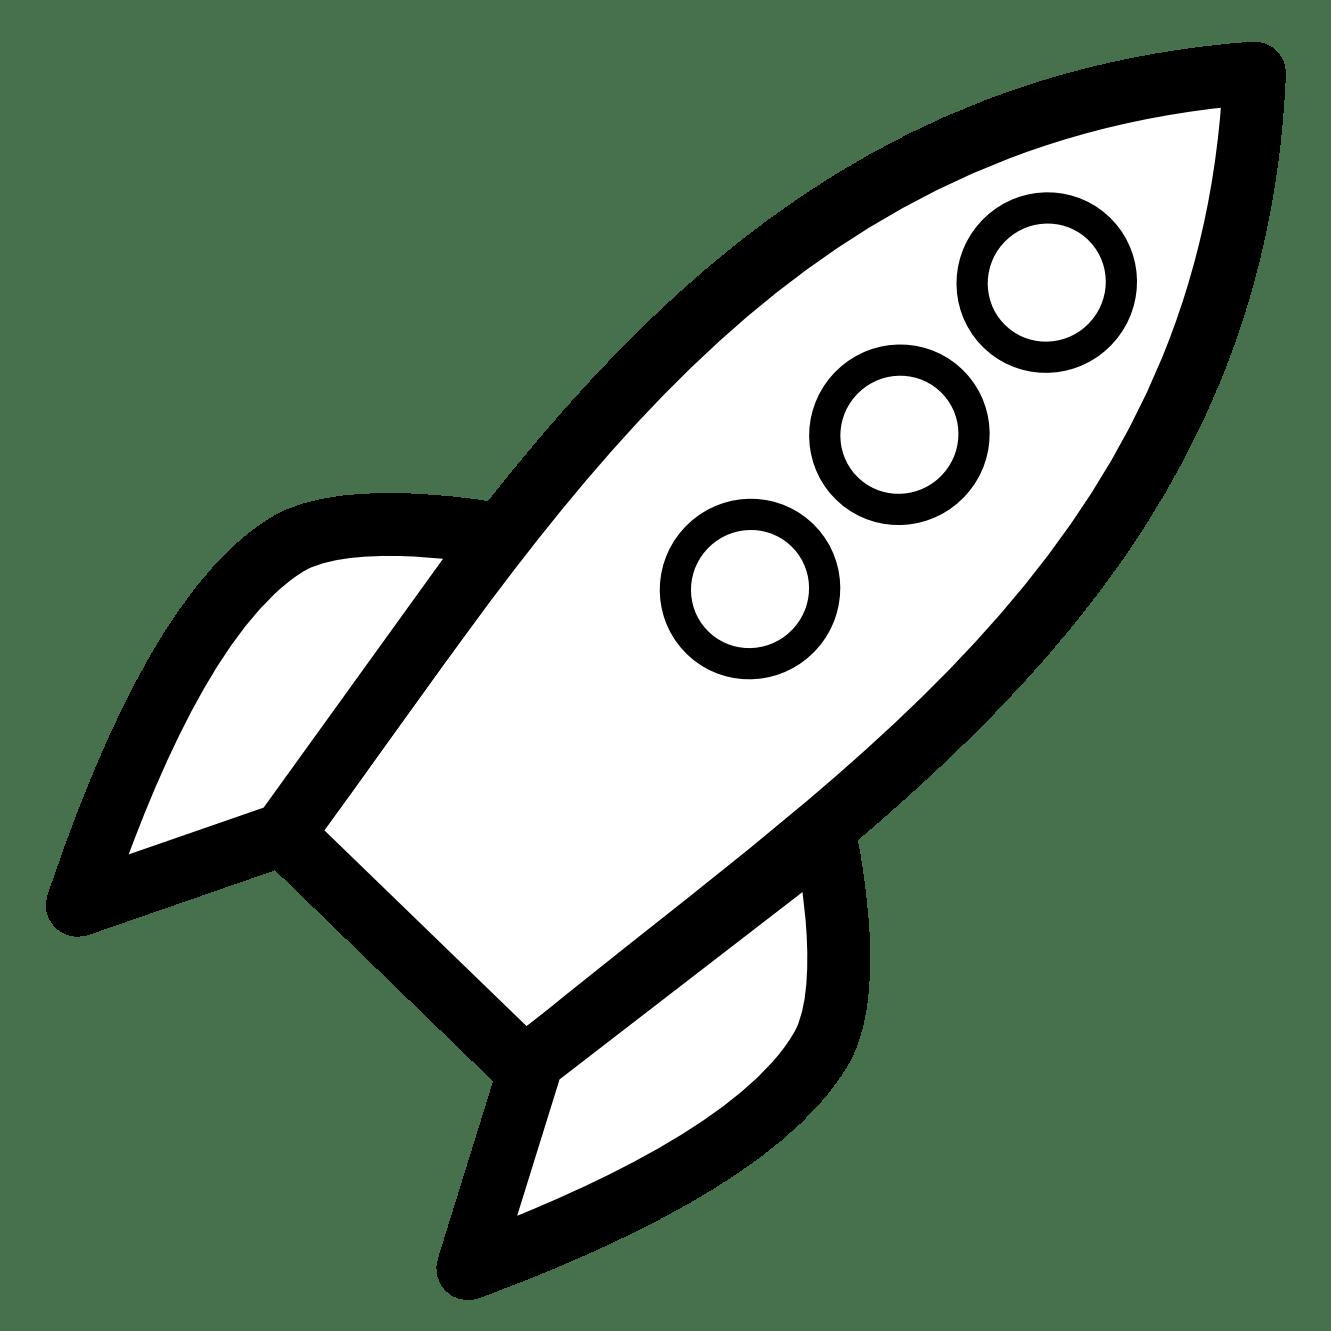 Rocket Clip Art Free Free Clipart Images